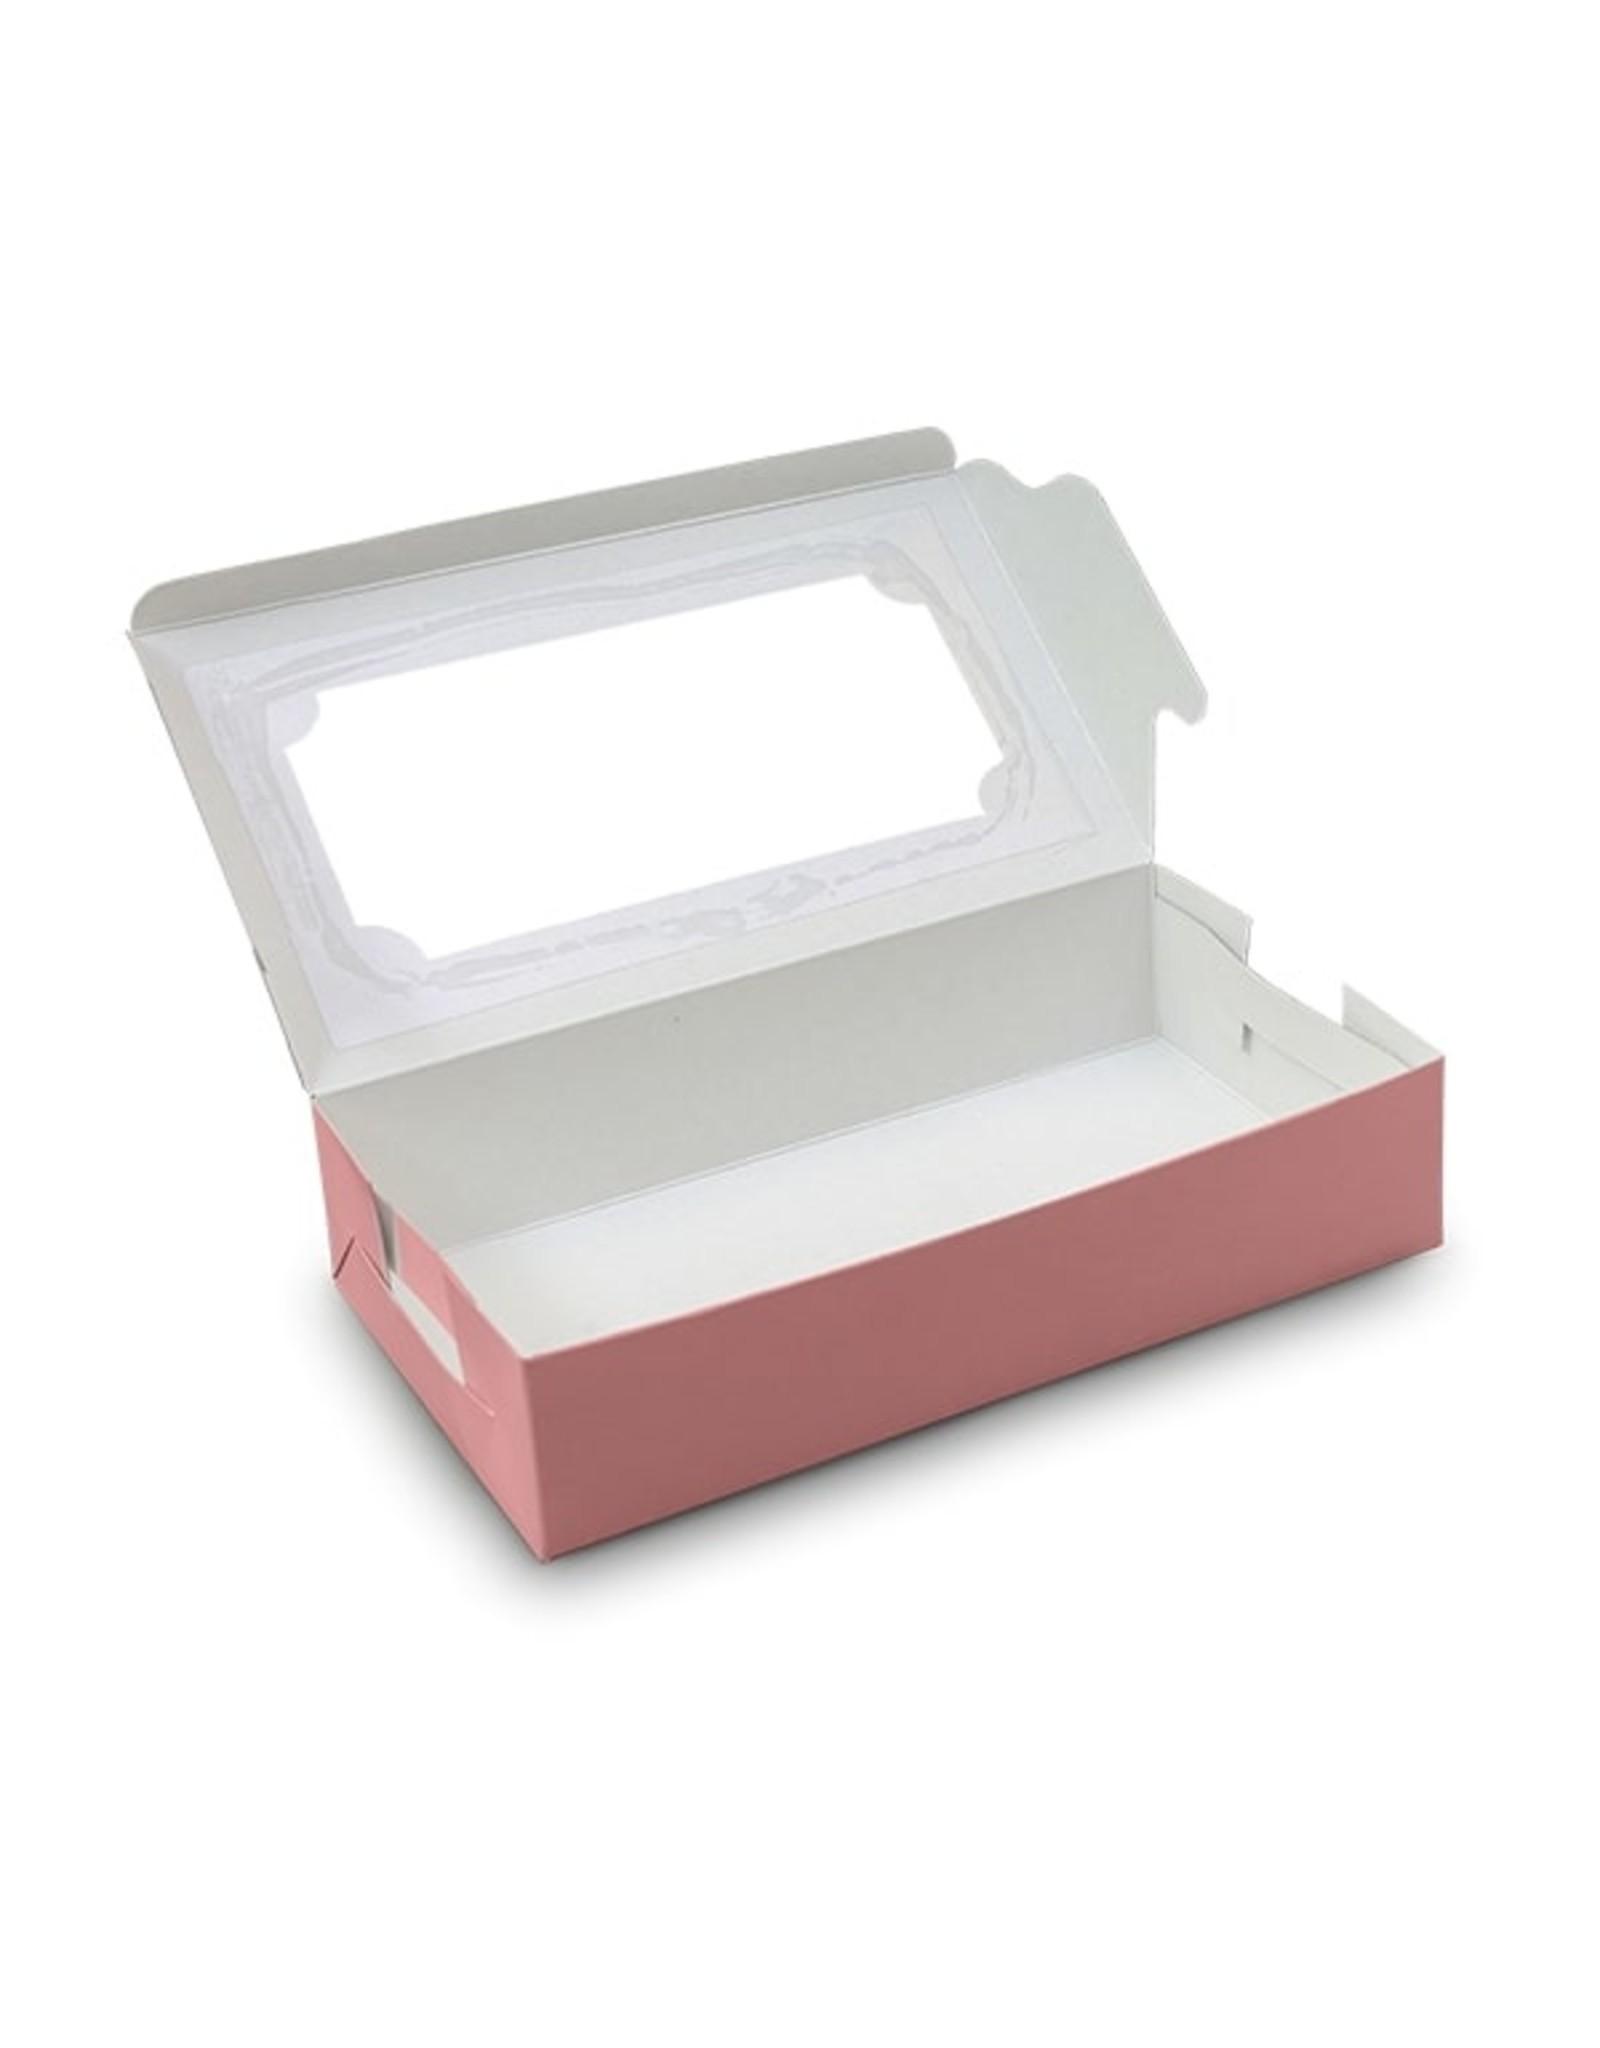 Pink sweetsbox - 23 x 12,5 x 5 cm (per 10 pieces)